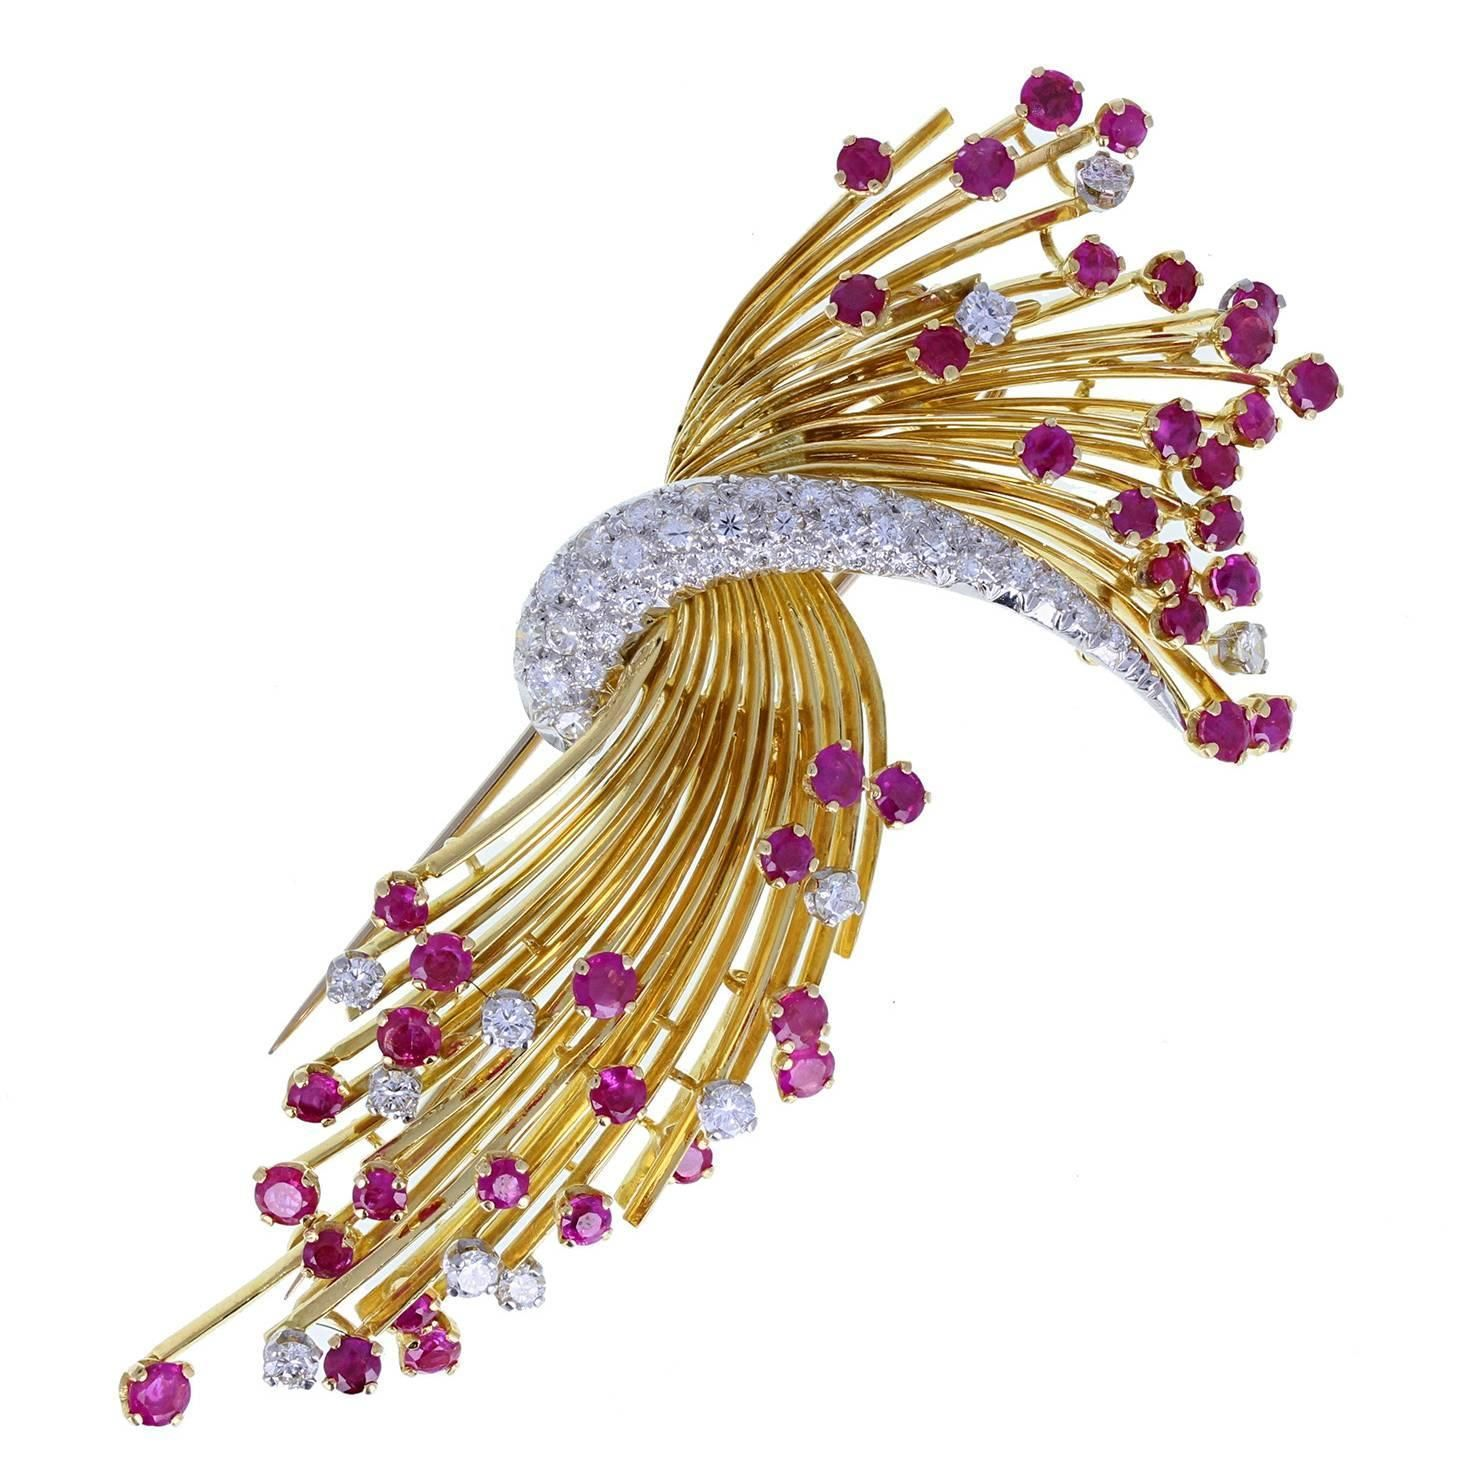 Kutchinsky Ruby Diamond Gold Spray Brooch Gold spray Brooches and